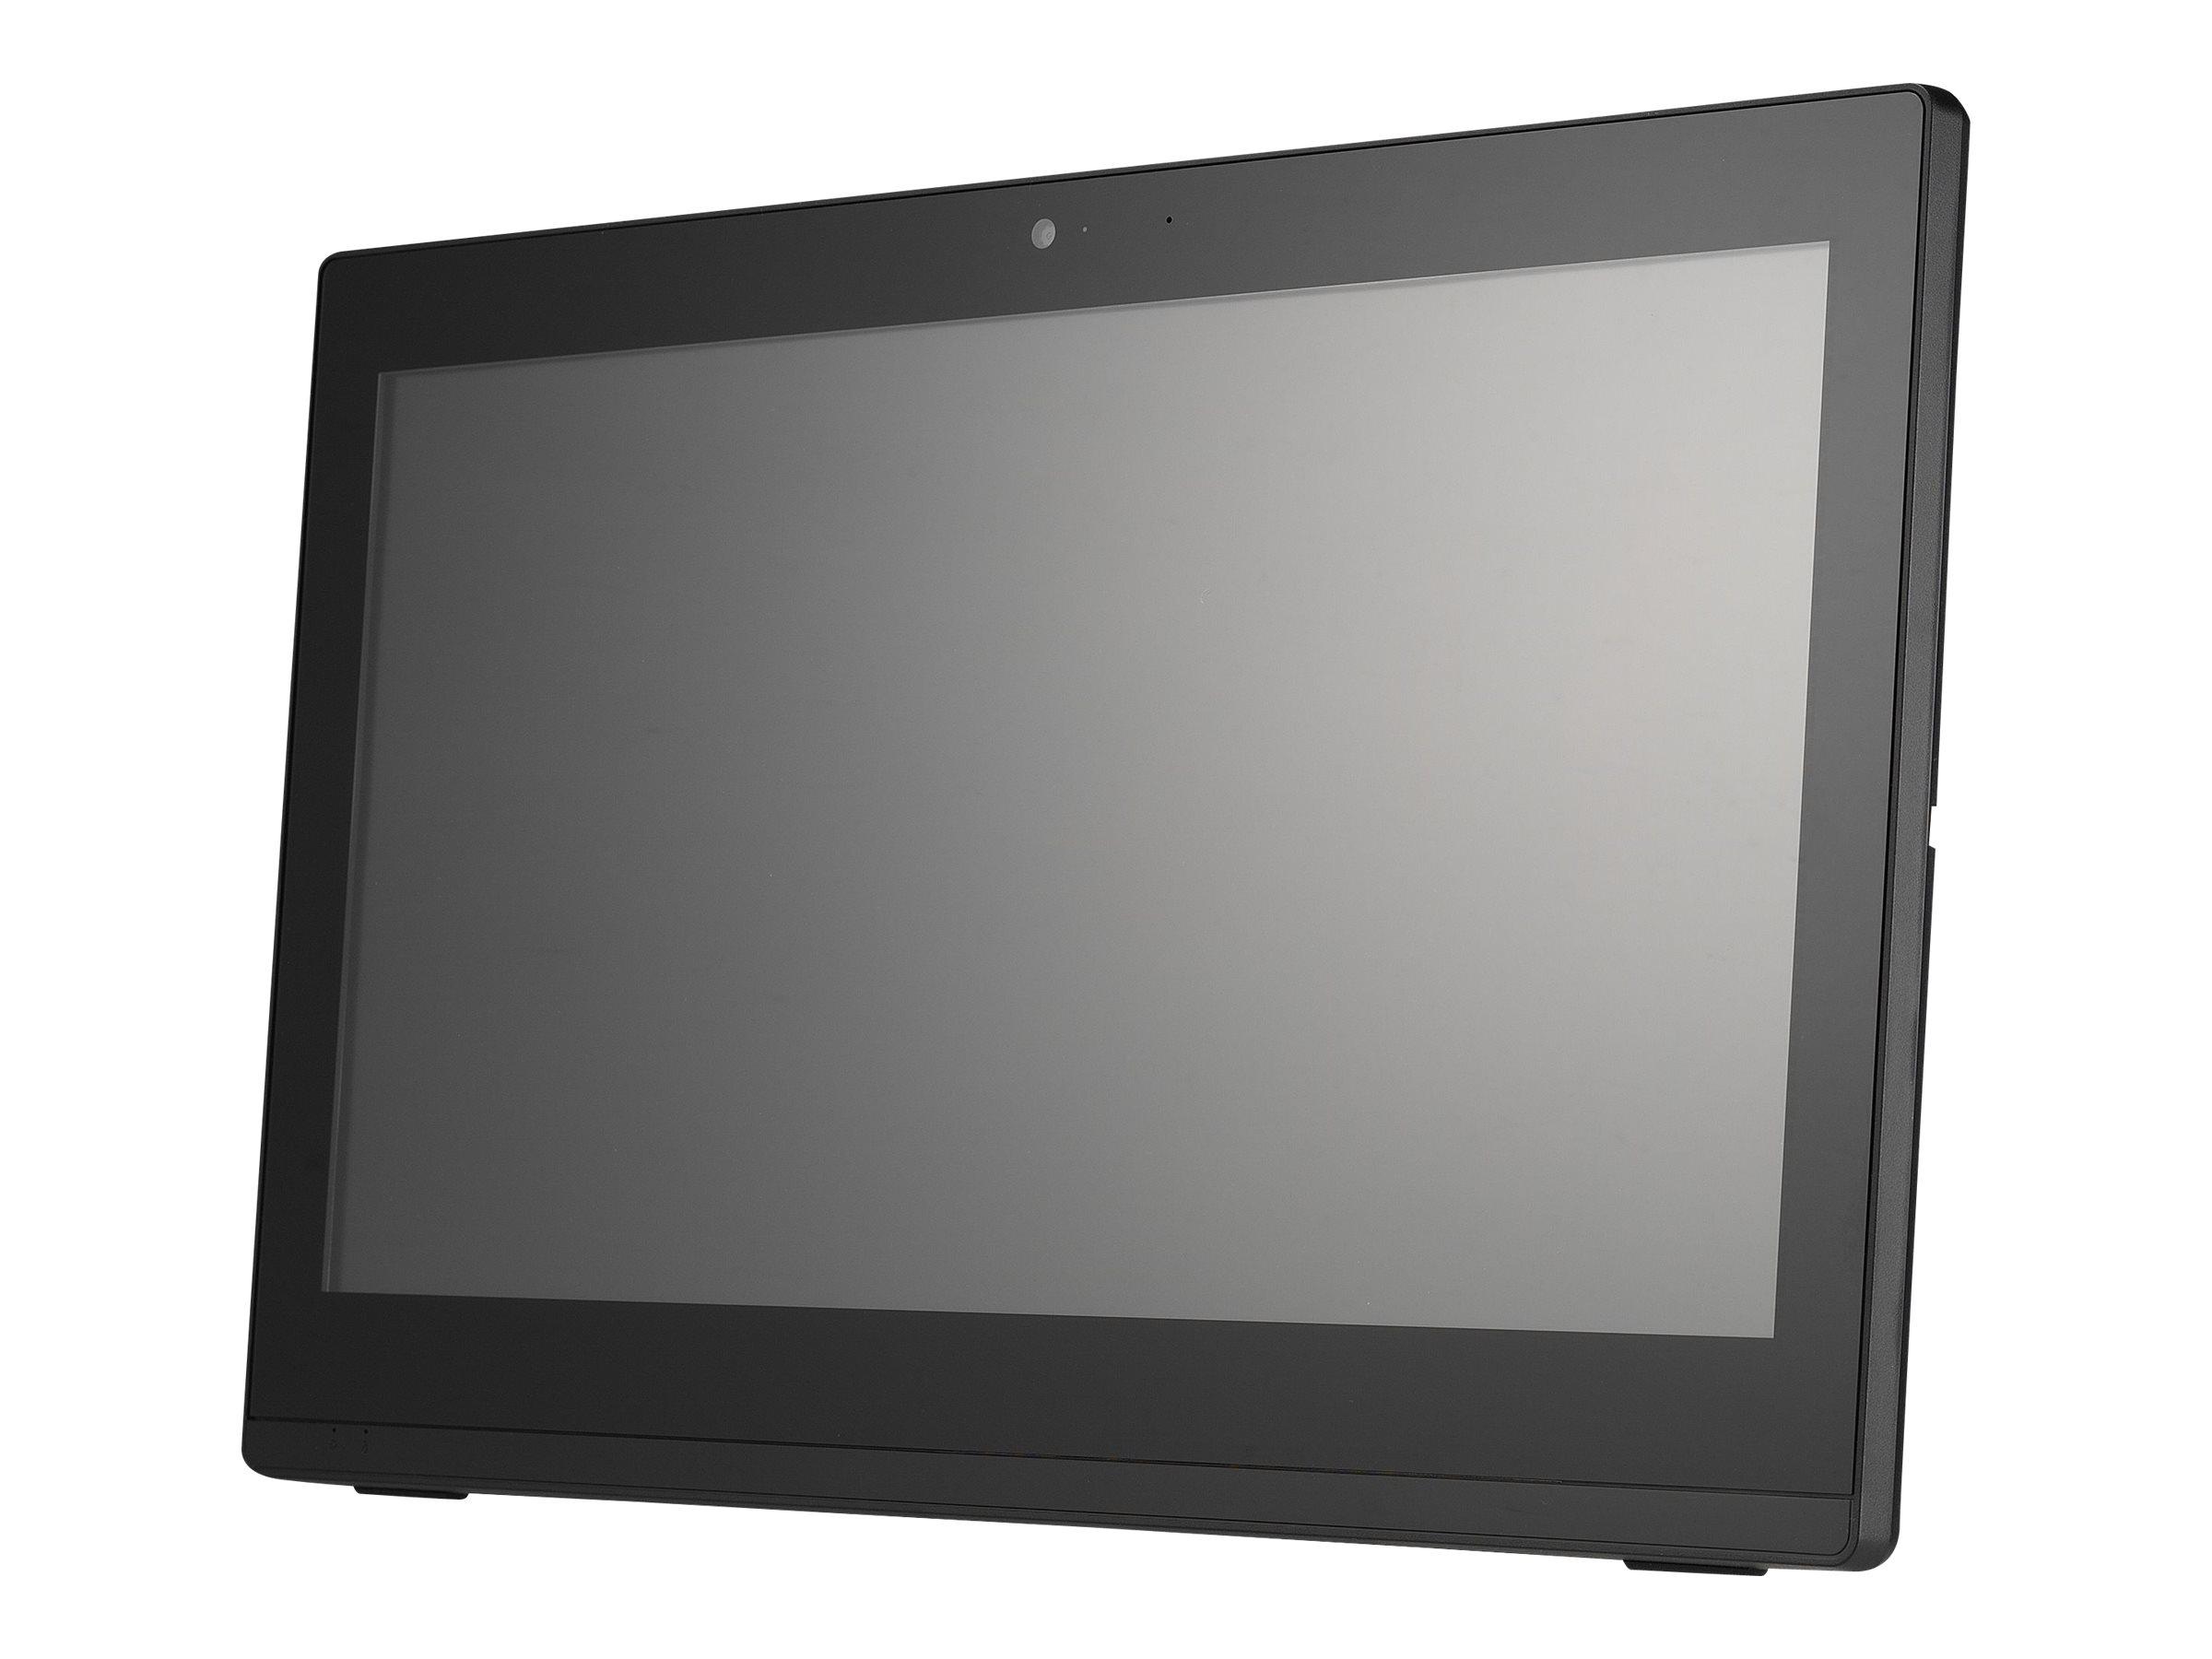 Shuttle XPC P90U - Barebone - All-in-One (Komplettlösung) - 1 x Celeron 3865U / 1.8 GHz ULV - RAM 0 GB - HD Graphics 610